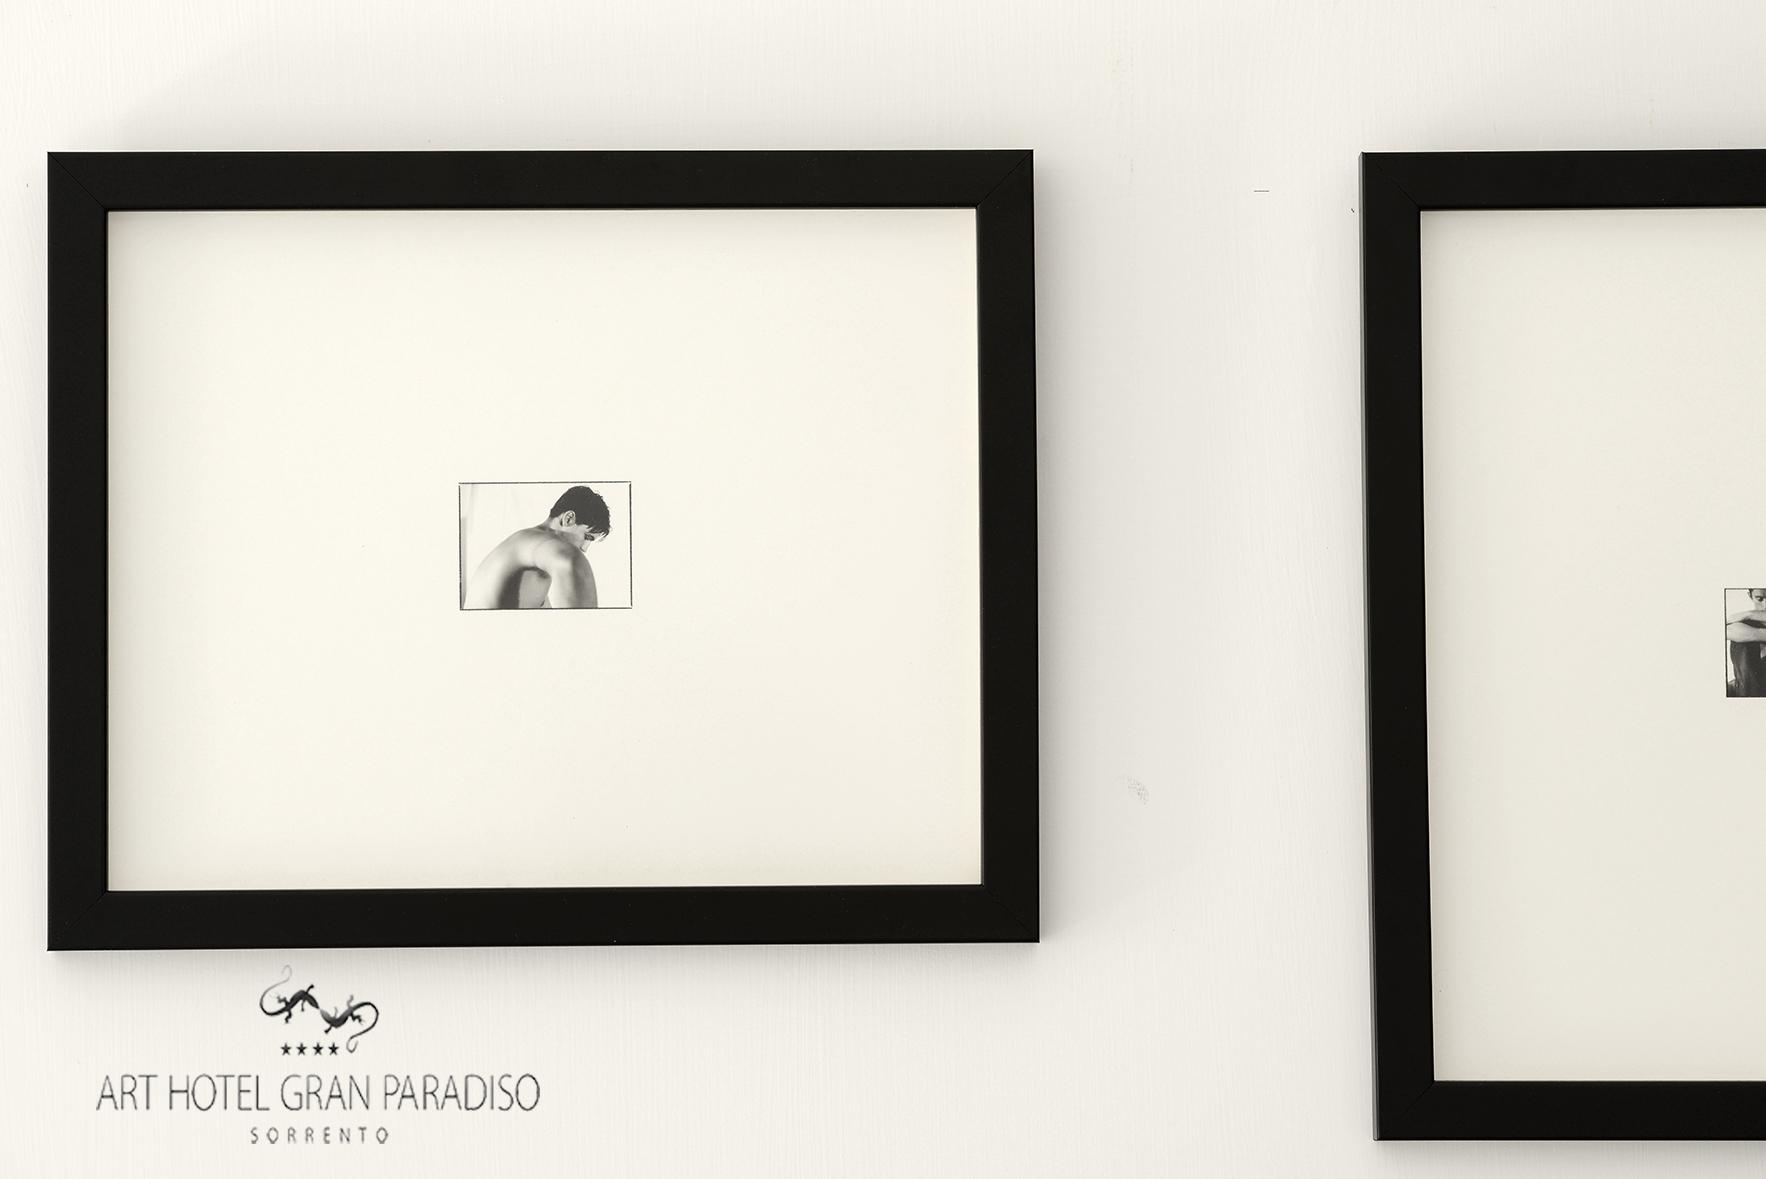 Art_Hotel_Gran_Paradiso_2013_412_Luca_Massimo_Barbero_5.jpg